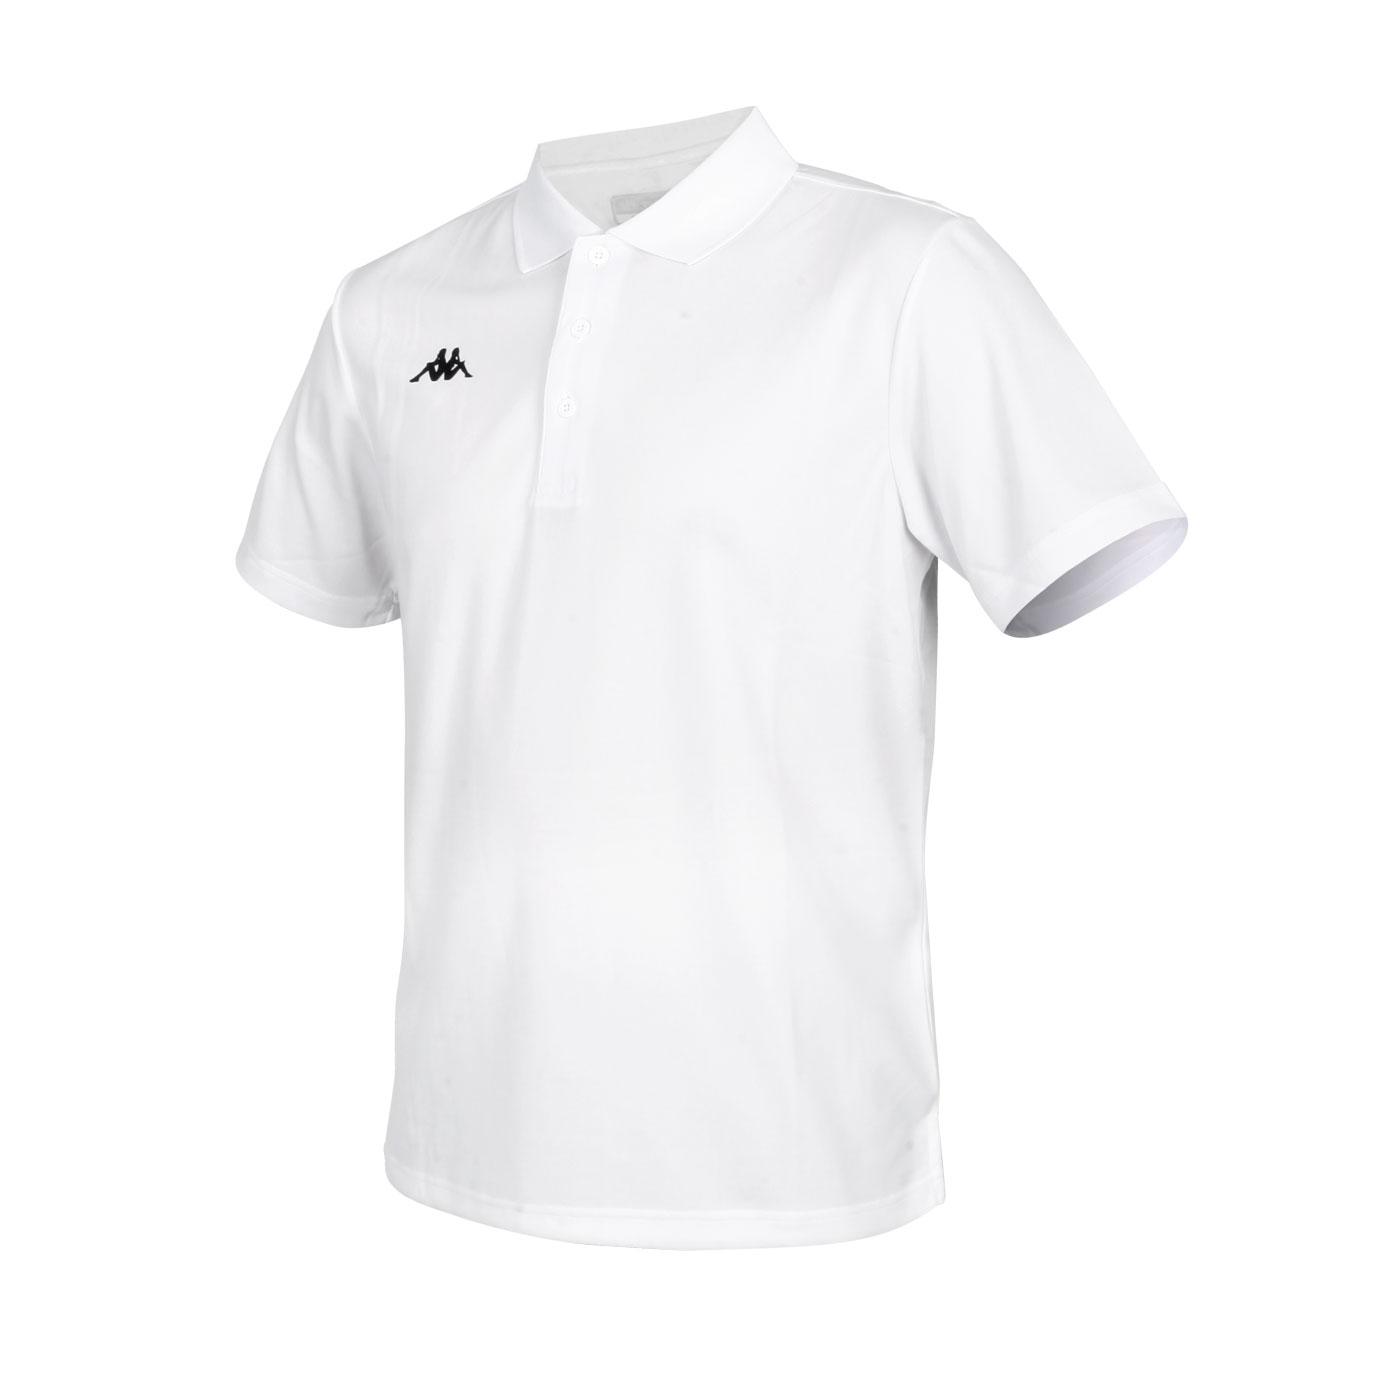 KAPPA 男款K4T短袖POLO衫 321762W-001